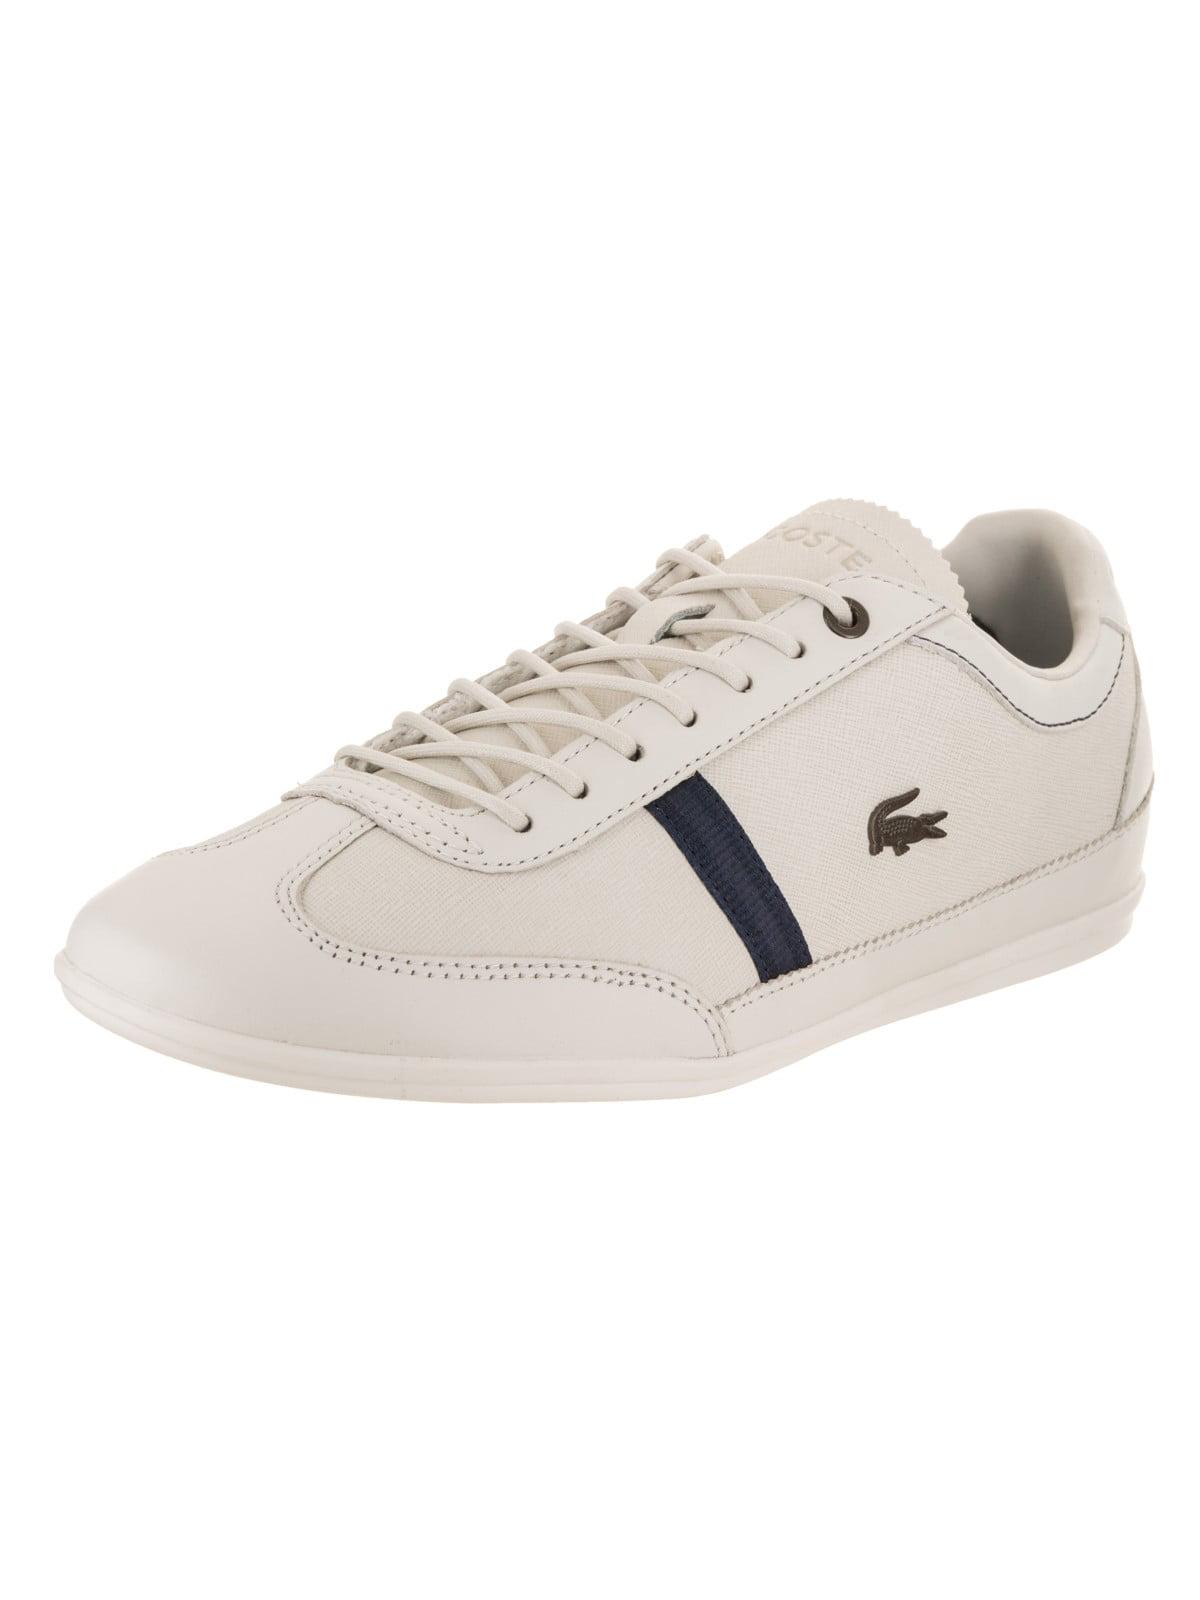 Lacoste Men's Misano 318 1 CAM Casual Shoe